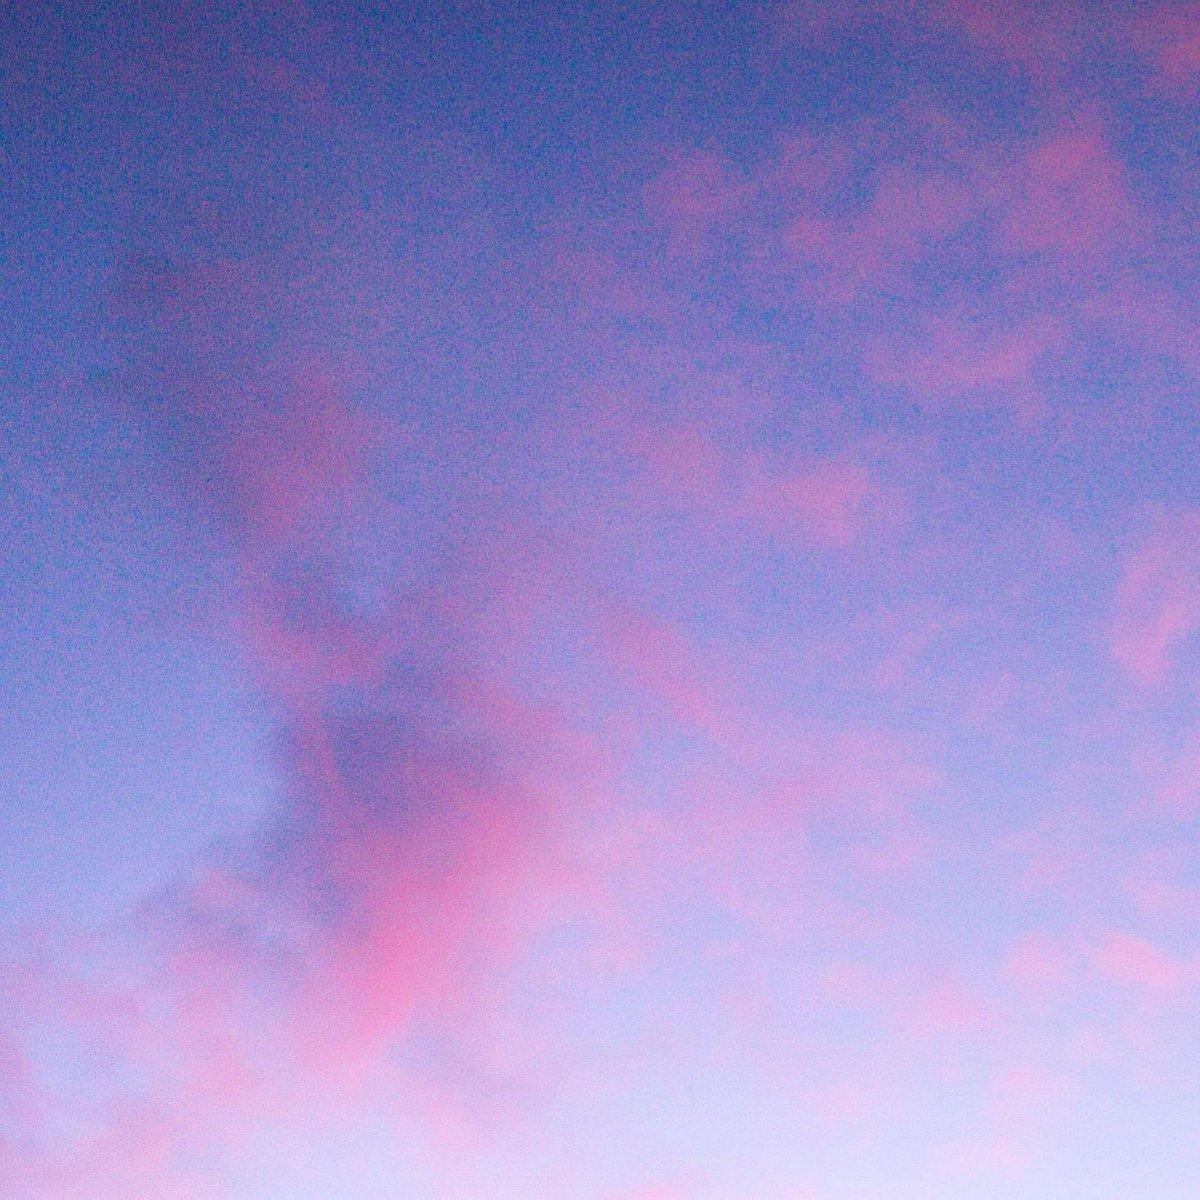 Kapuaʻi aka Clouds ◇ #hawaiian #word #clouds #sky #cloud #pinkclouds #sky #clouds☁ #skyphotography #purplesky #pinksky #photographylovers #photographylifestyle #wales #northwales #northwalesphotography #naturalworld #environment #photographymood #feels #tranquil